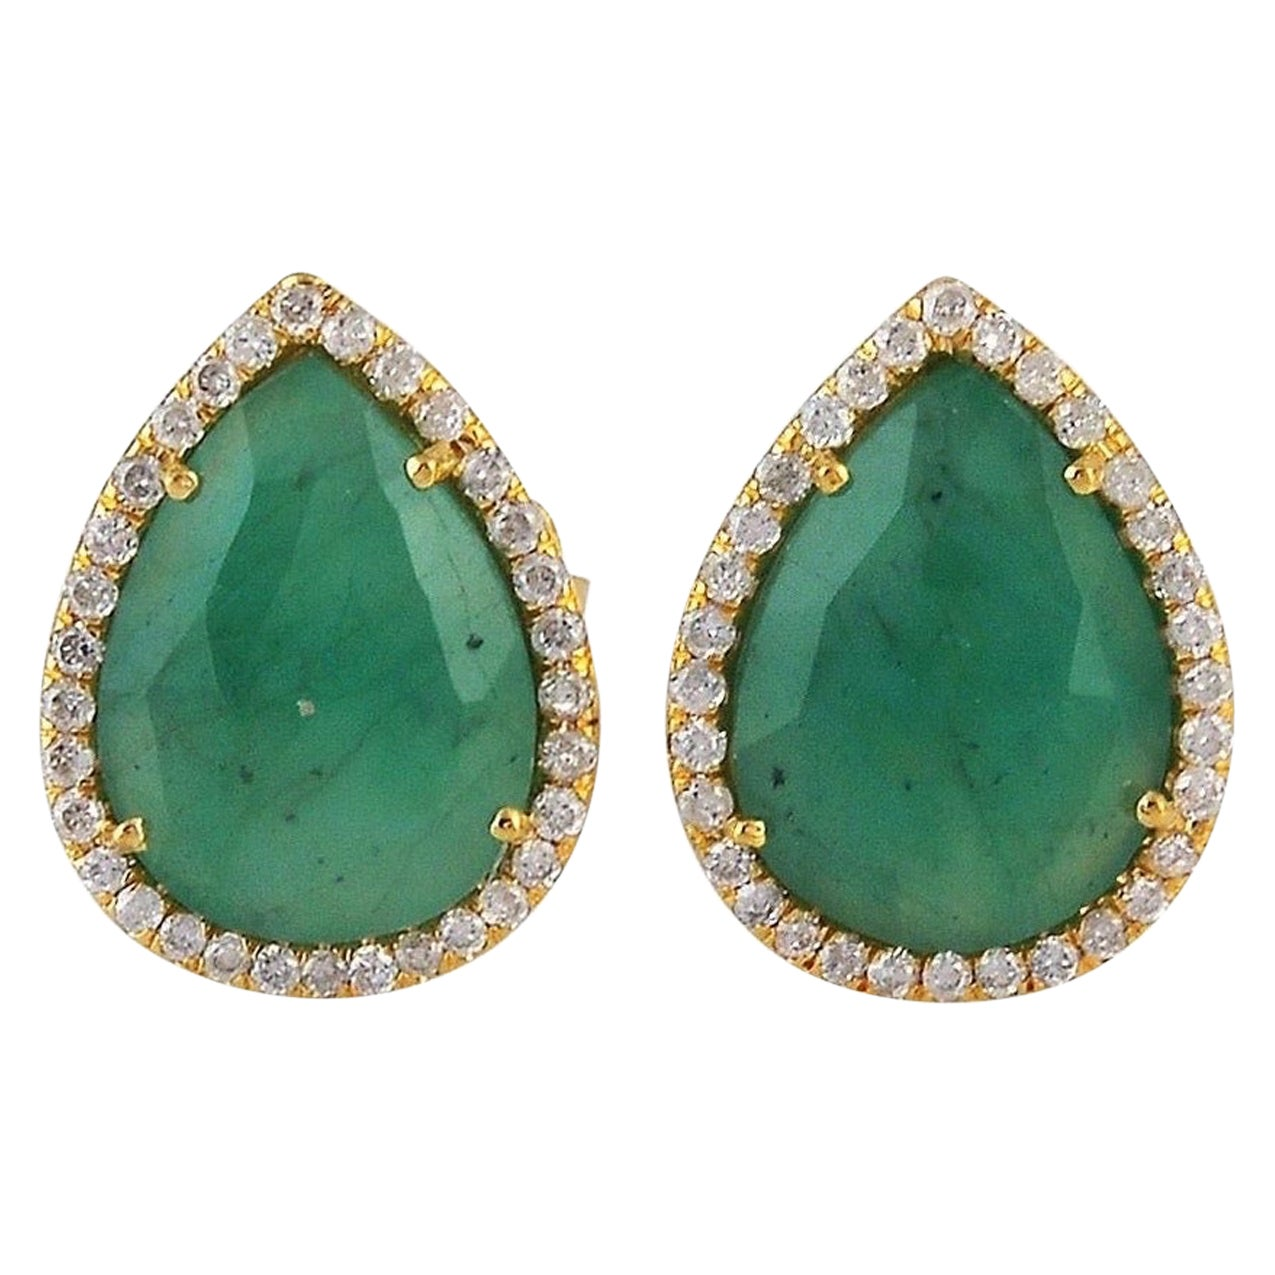 4.41 Carat Emerald Diamond 18 Karat Gold Stud Earrings